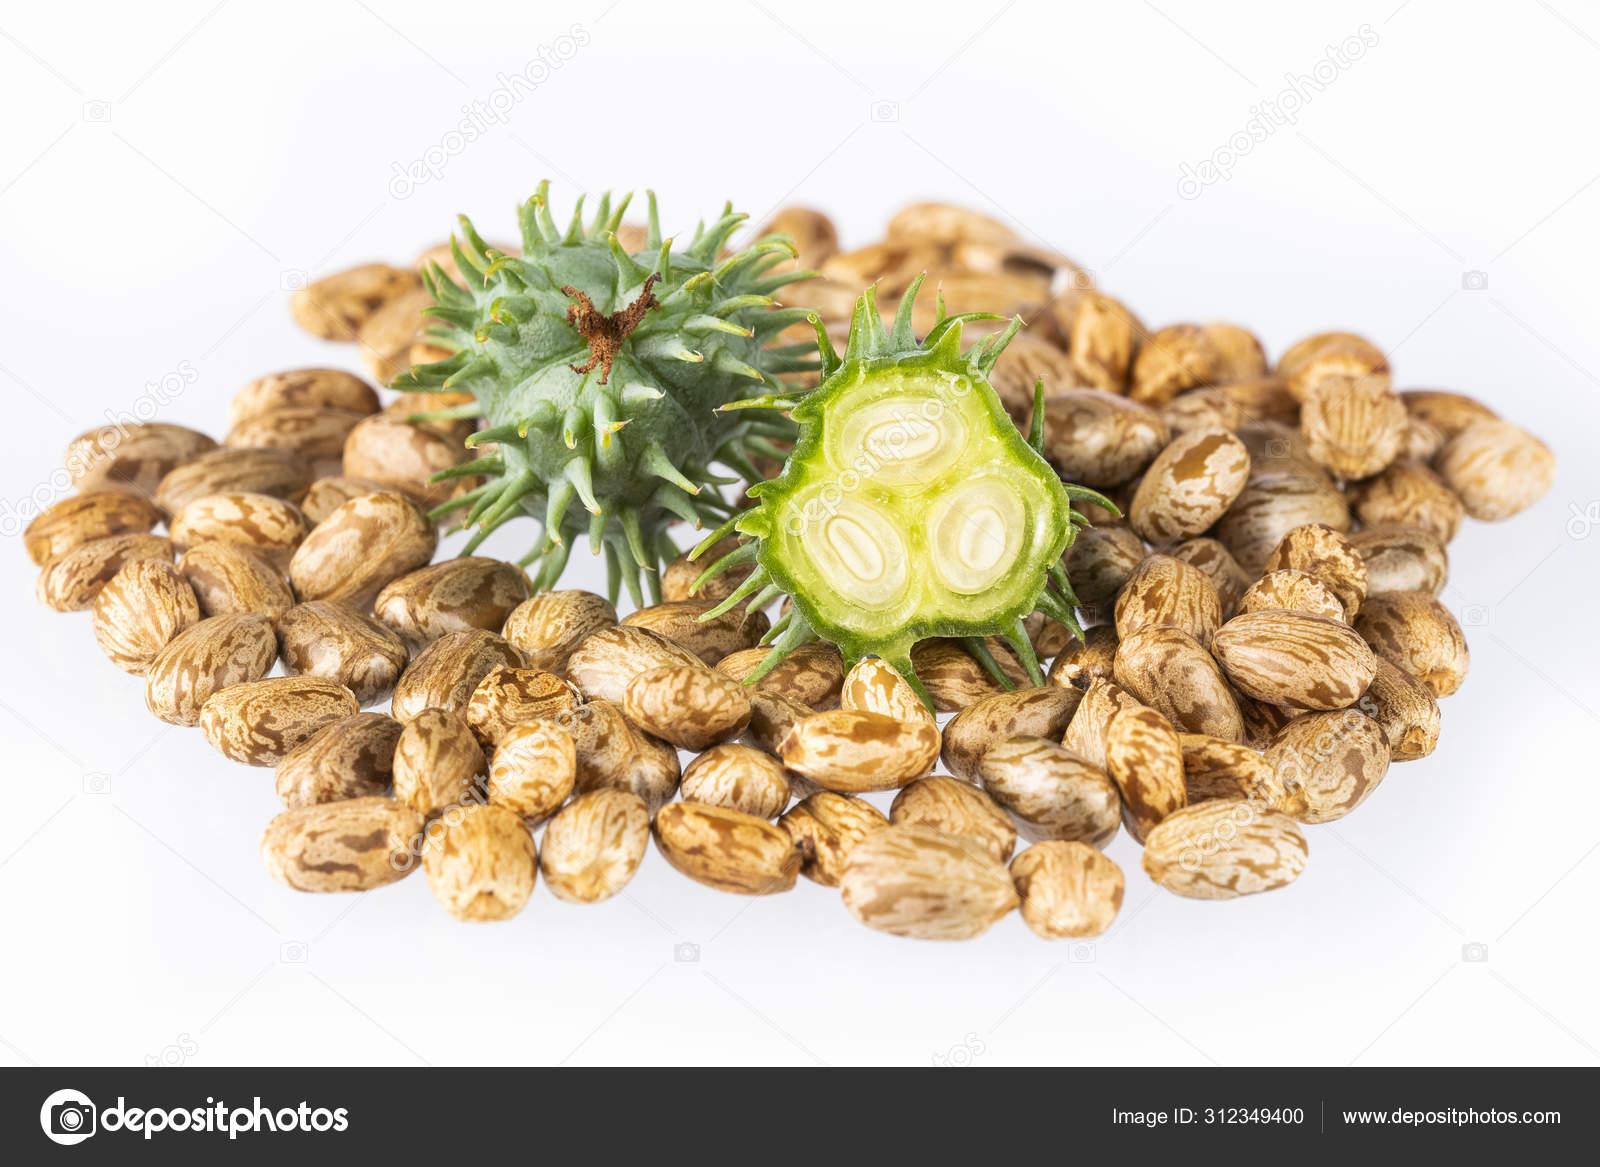 Green Castor Seeds Ricinus Communis Stock Photo C Luisecheverriurrea 312349400